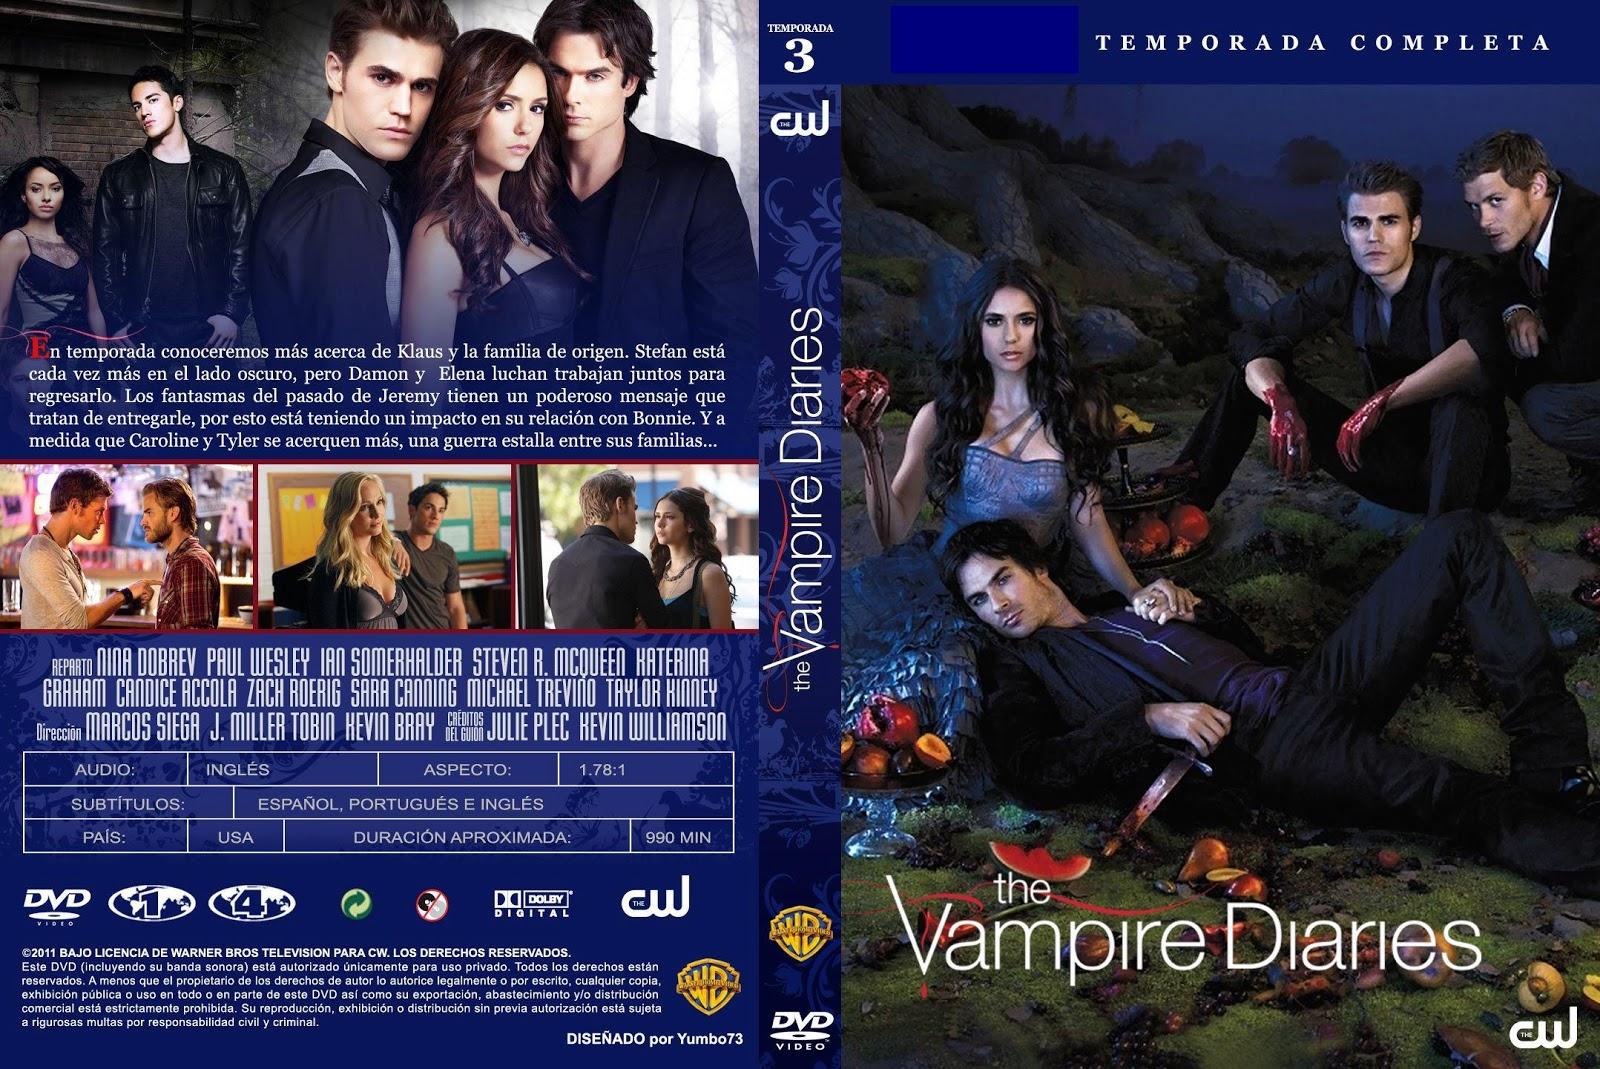 6x1 the vampire diaries legendado online dating 4